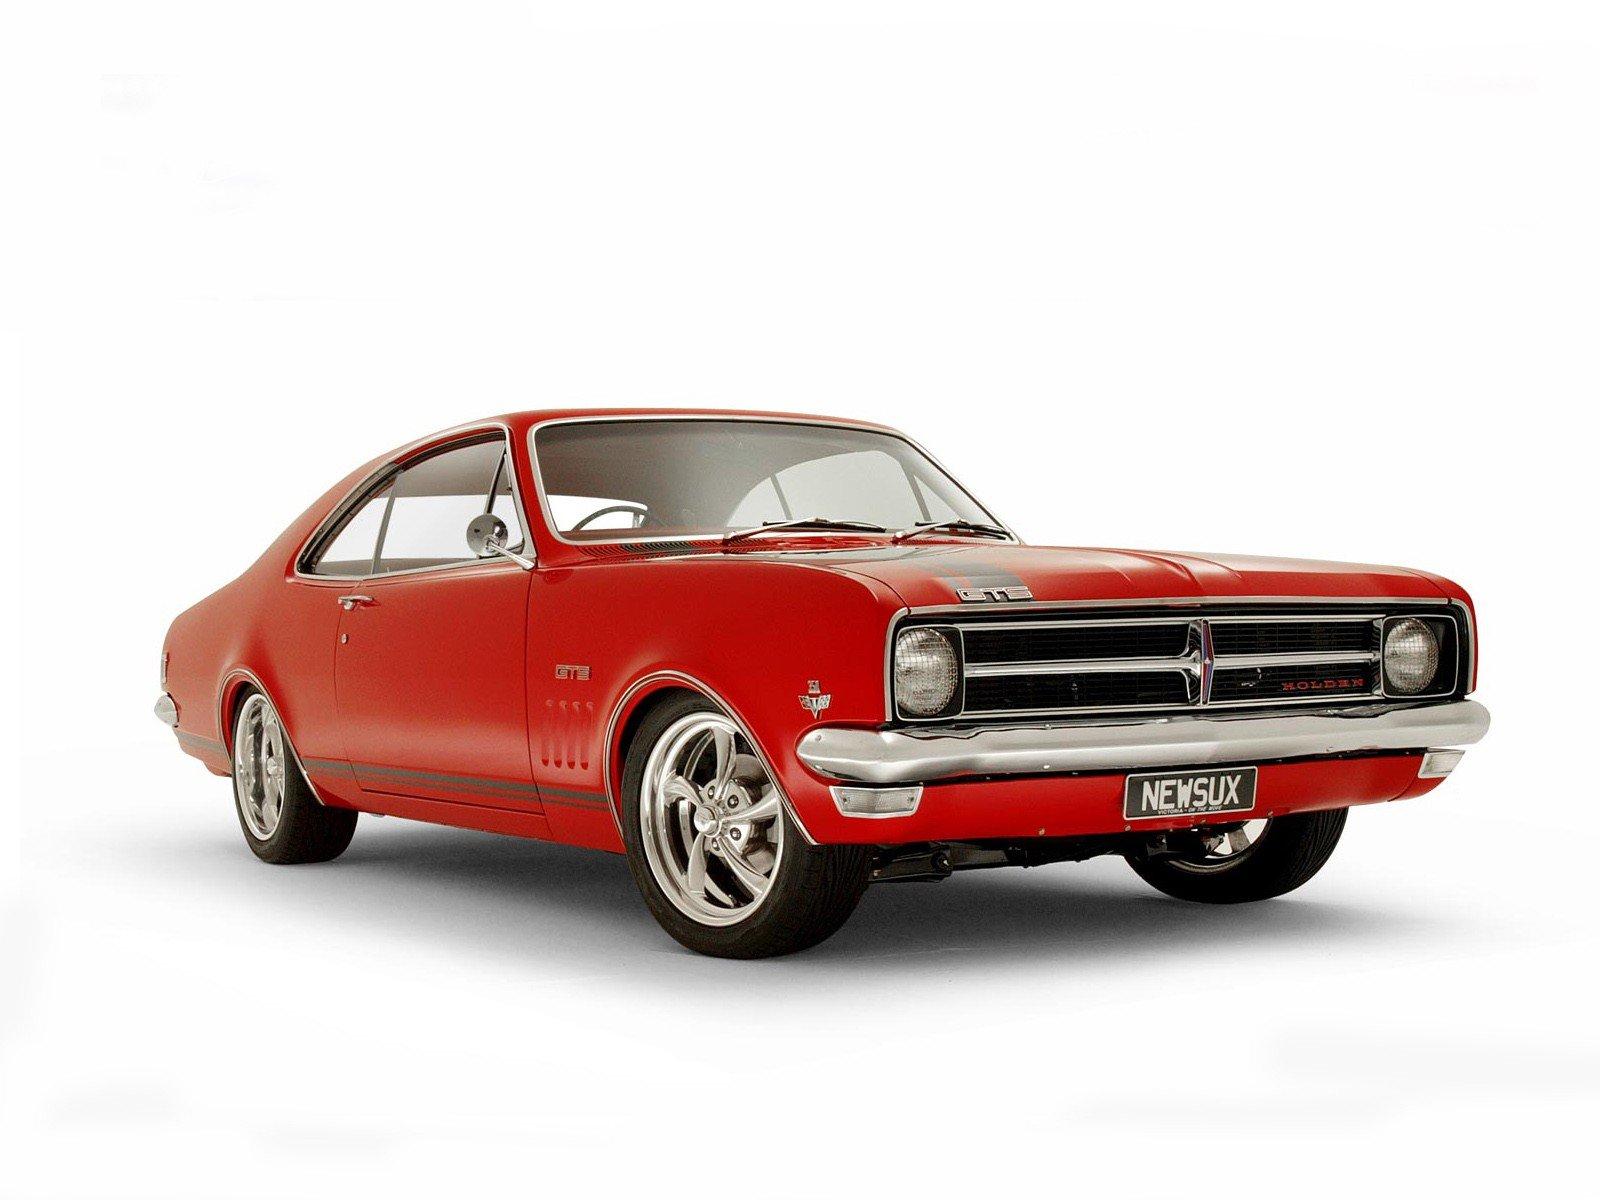 Black Red White Wheels Holden Gts Save Monaro Wallpaper